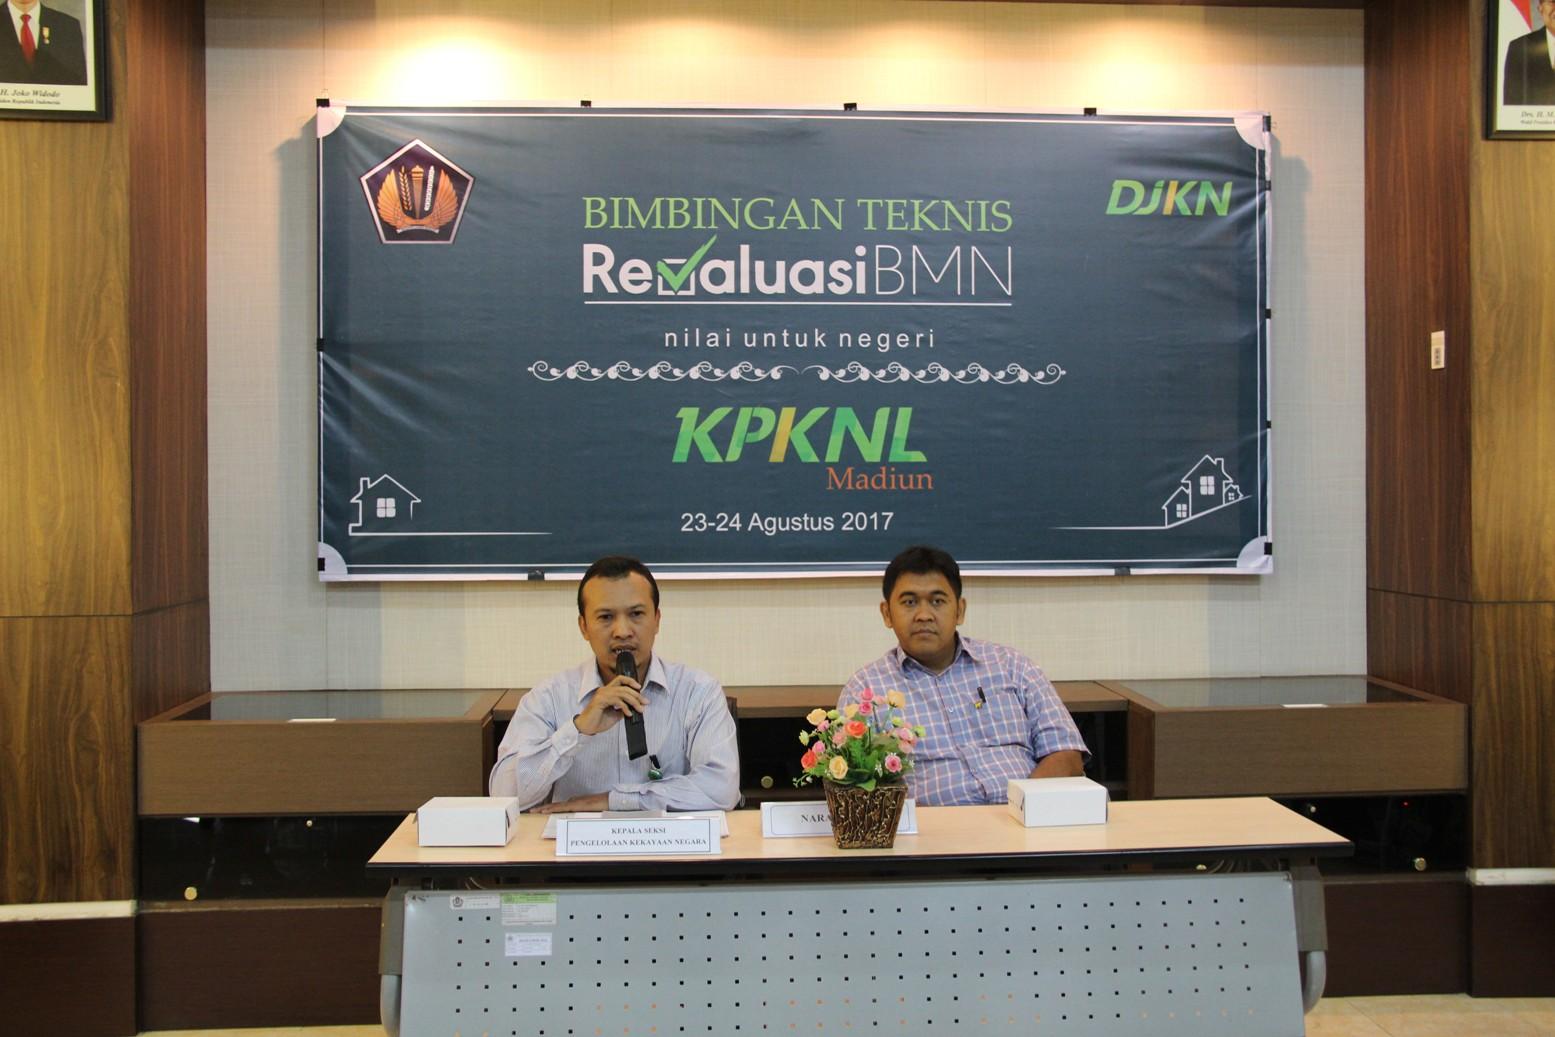 Semangat KPKNL Madiun Menyambut Pelaksanaan Revaluasi BMN 2017